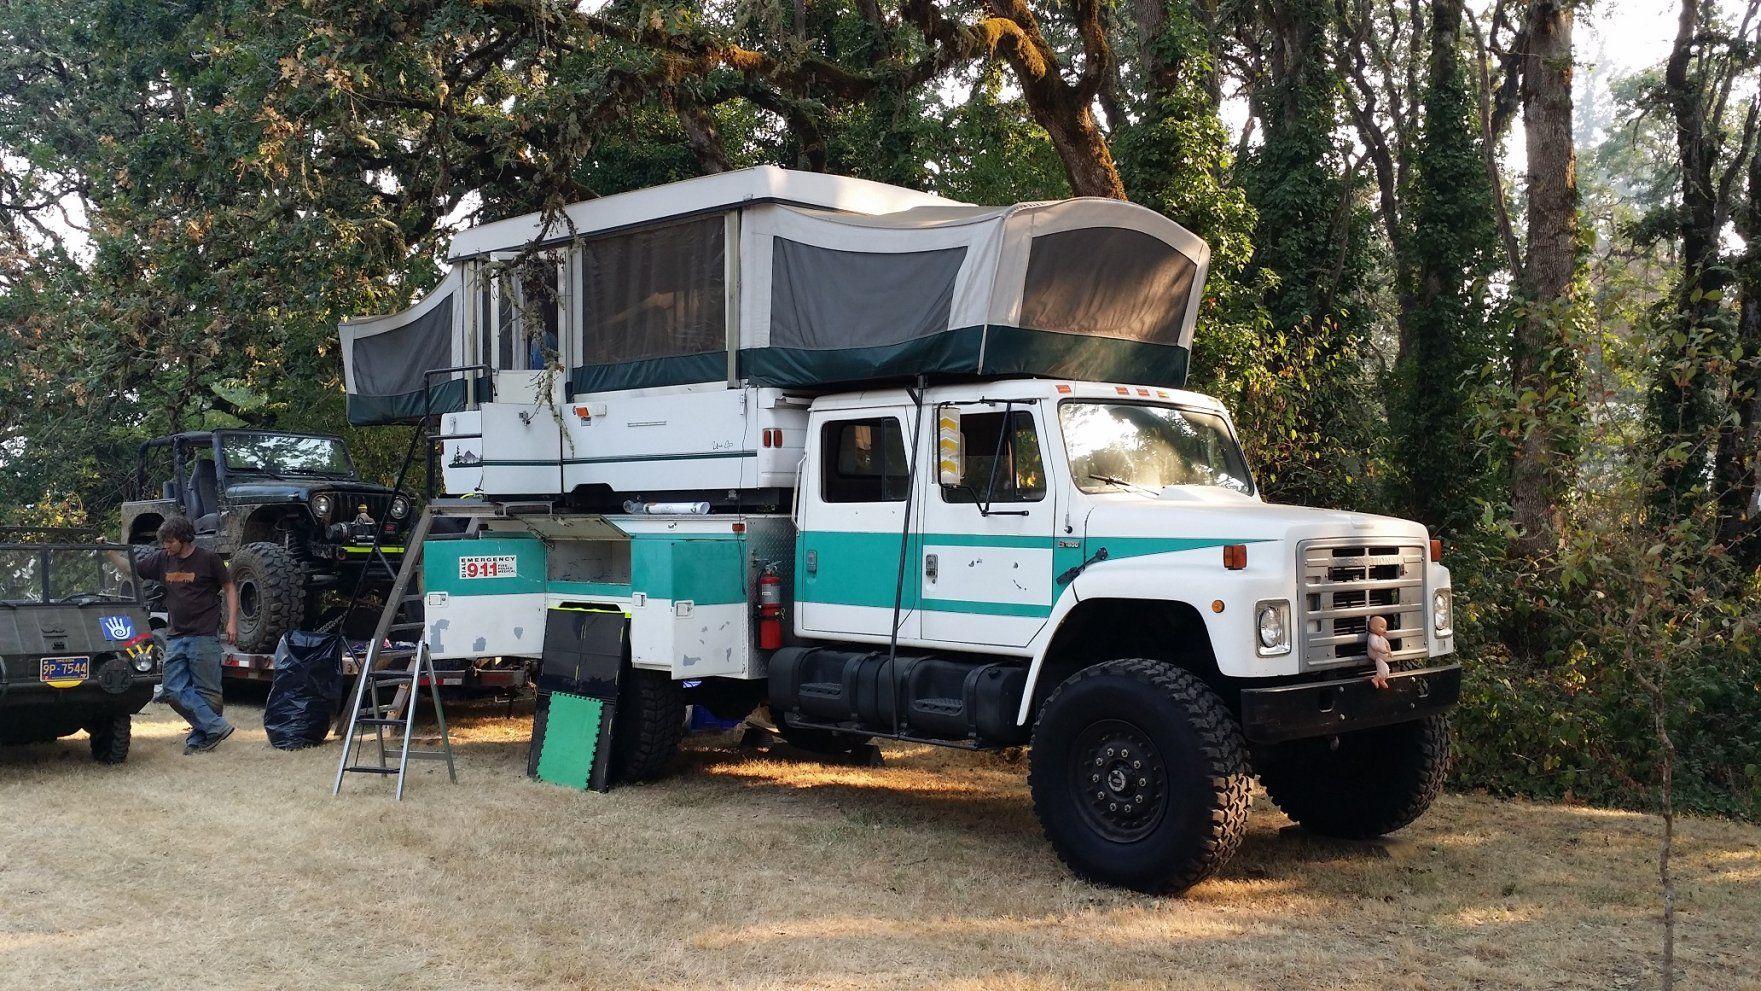 International 4700 4x4 Mdt Quadcab With Pop Up Expedition Truck